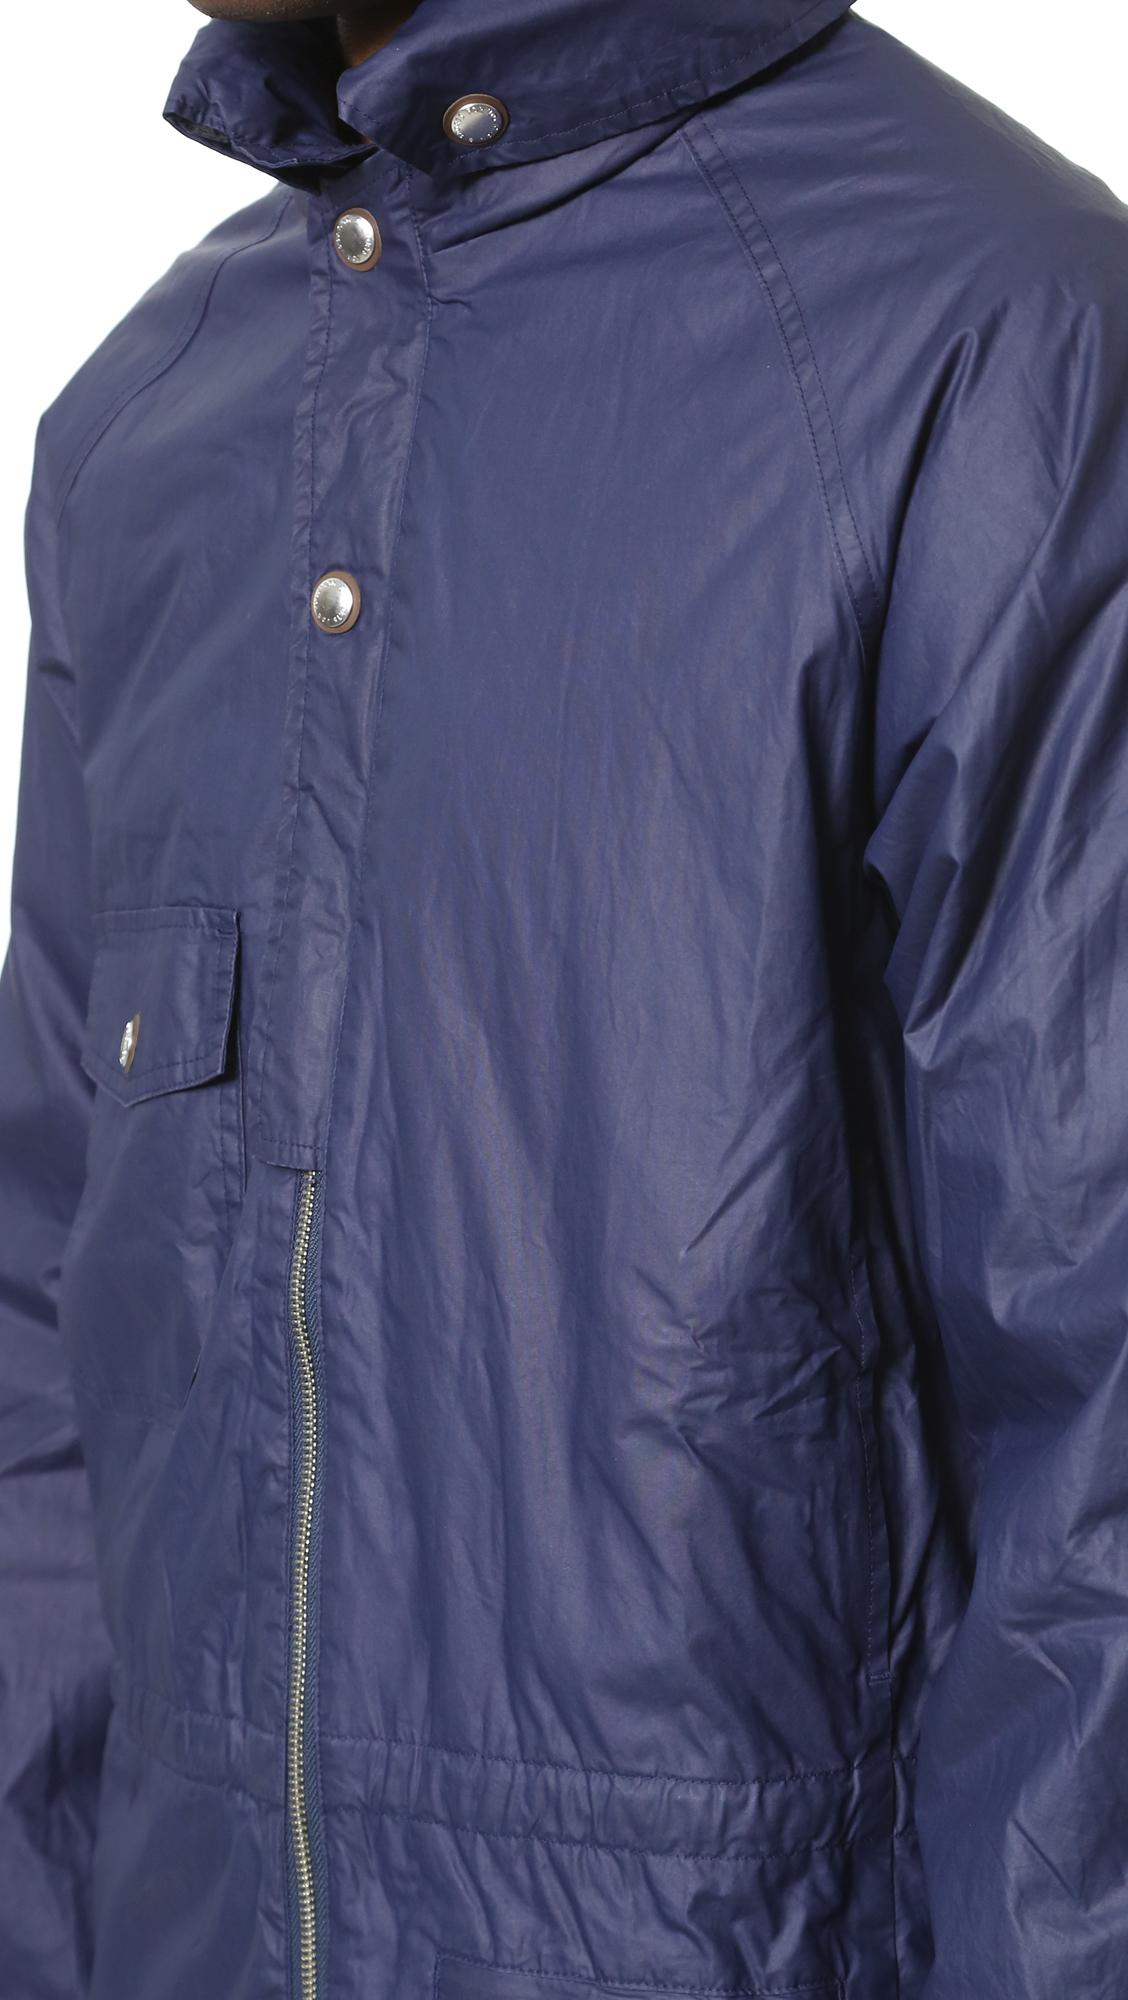 Garbstore Cotton Moss Parka in Navy (Blue) for Men